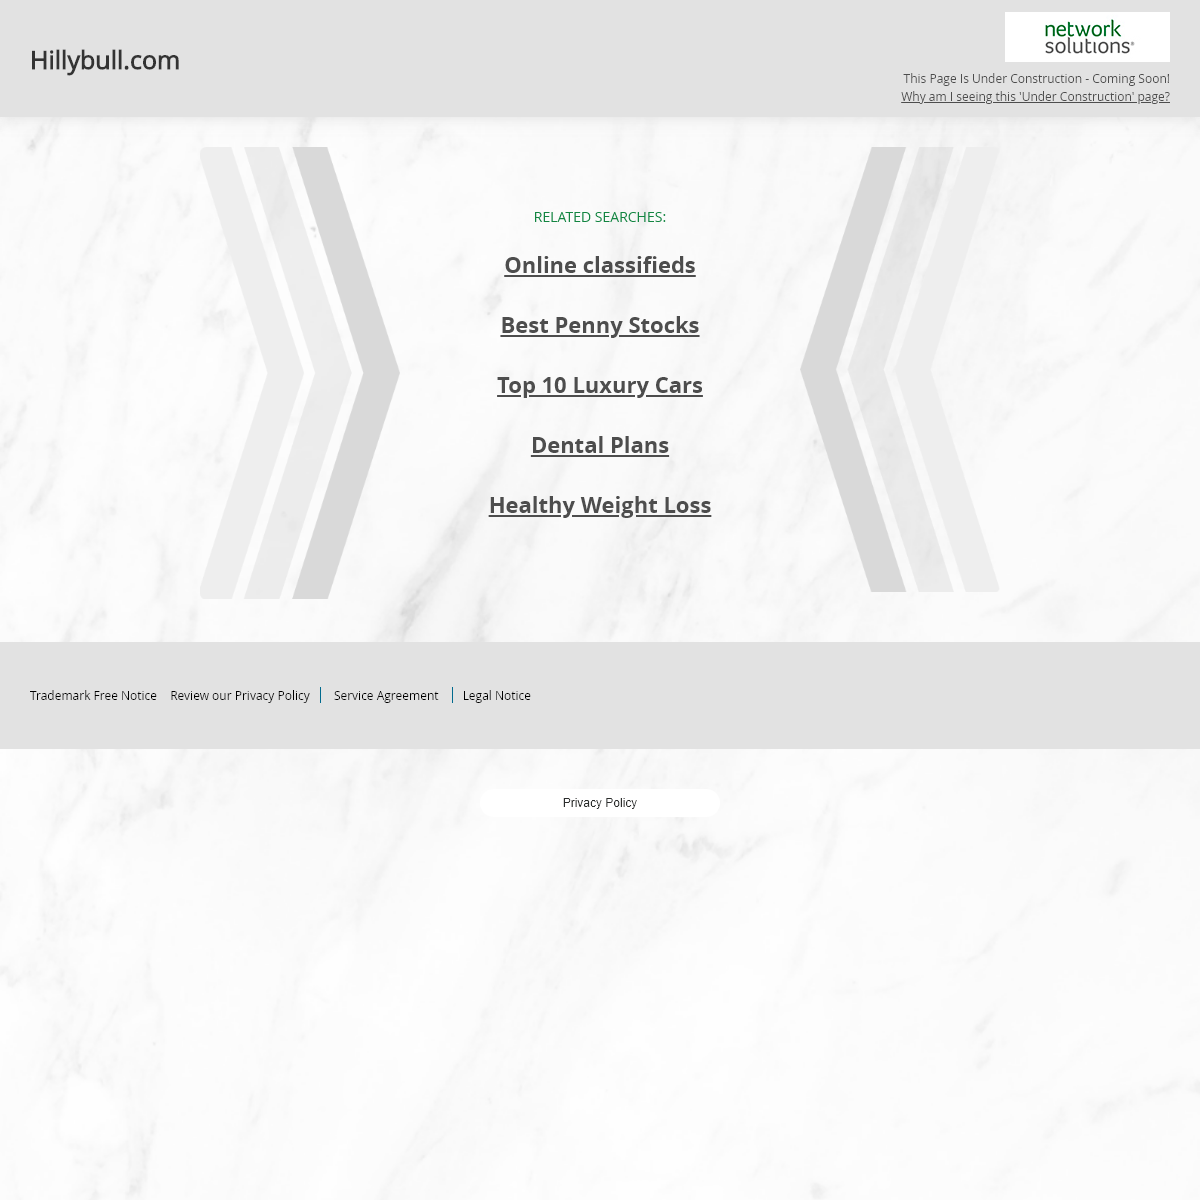 Hillybull.com